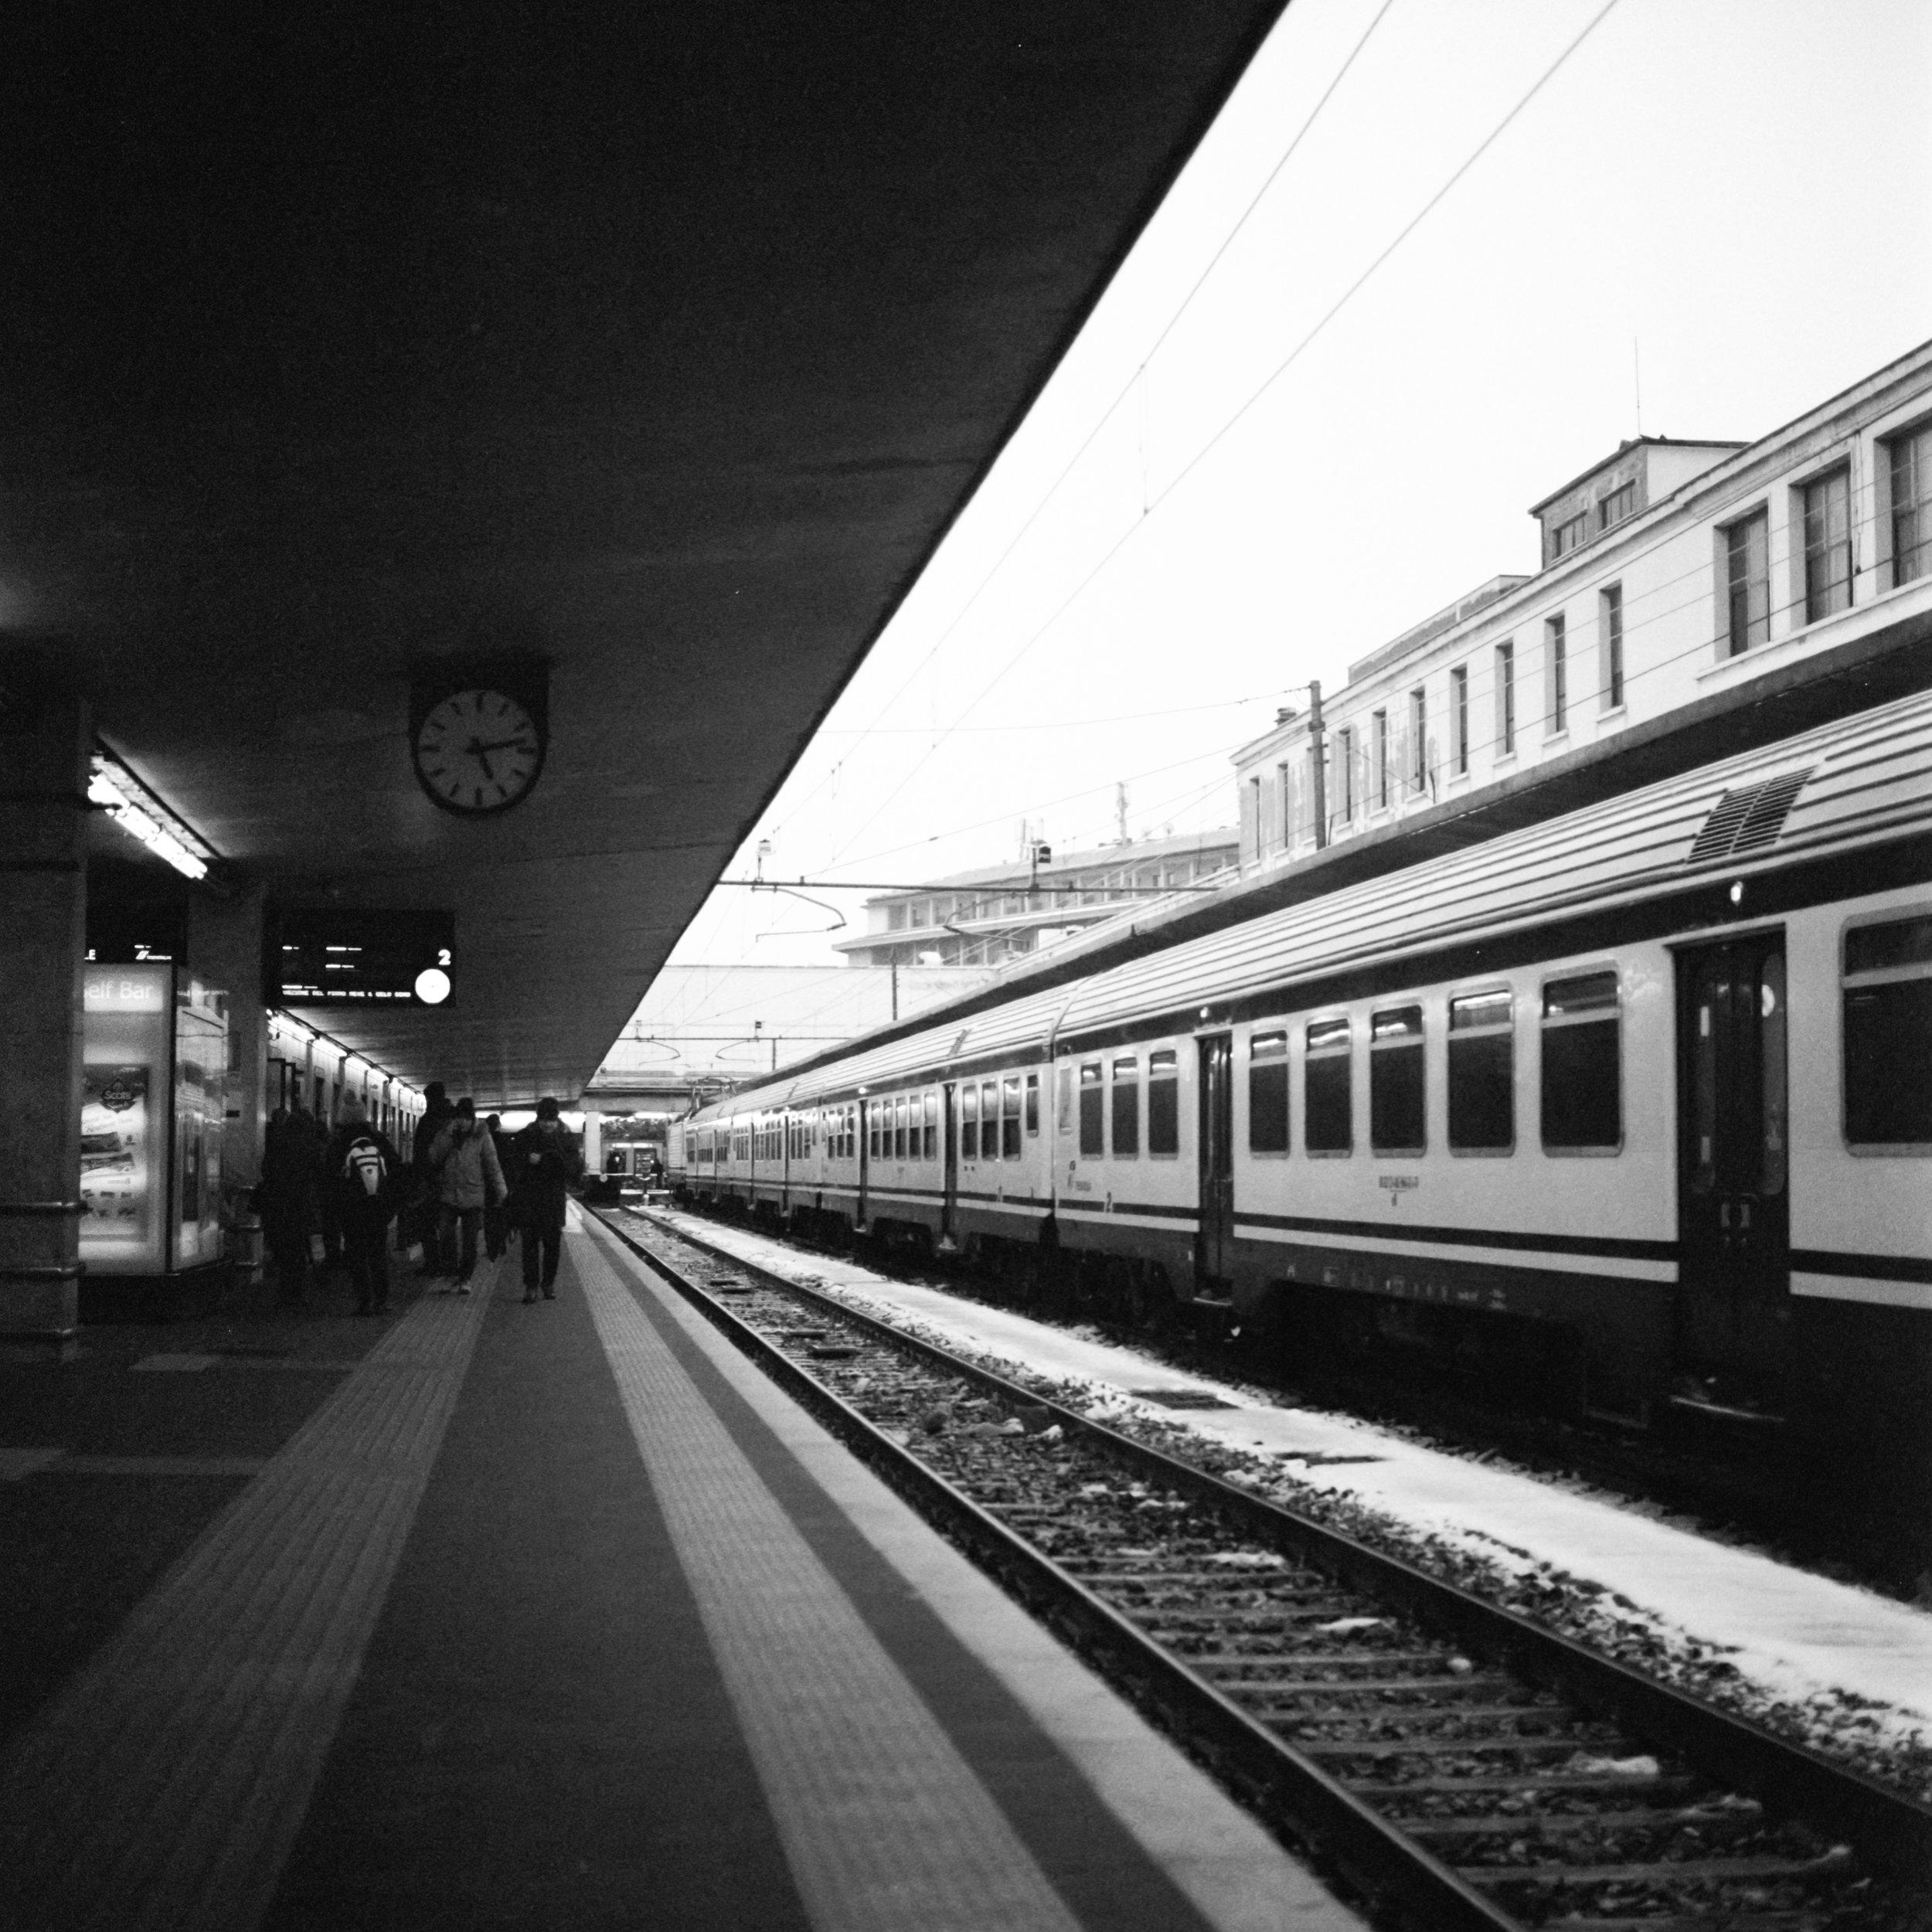 Train to Pisa Hasselblad 501c | Bergger Pancro 400